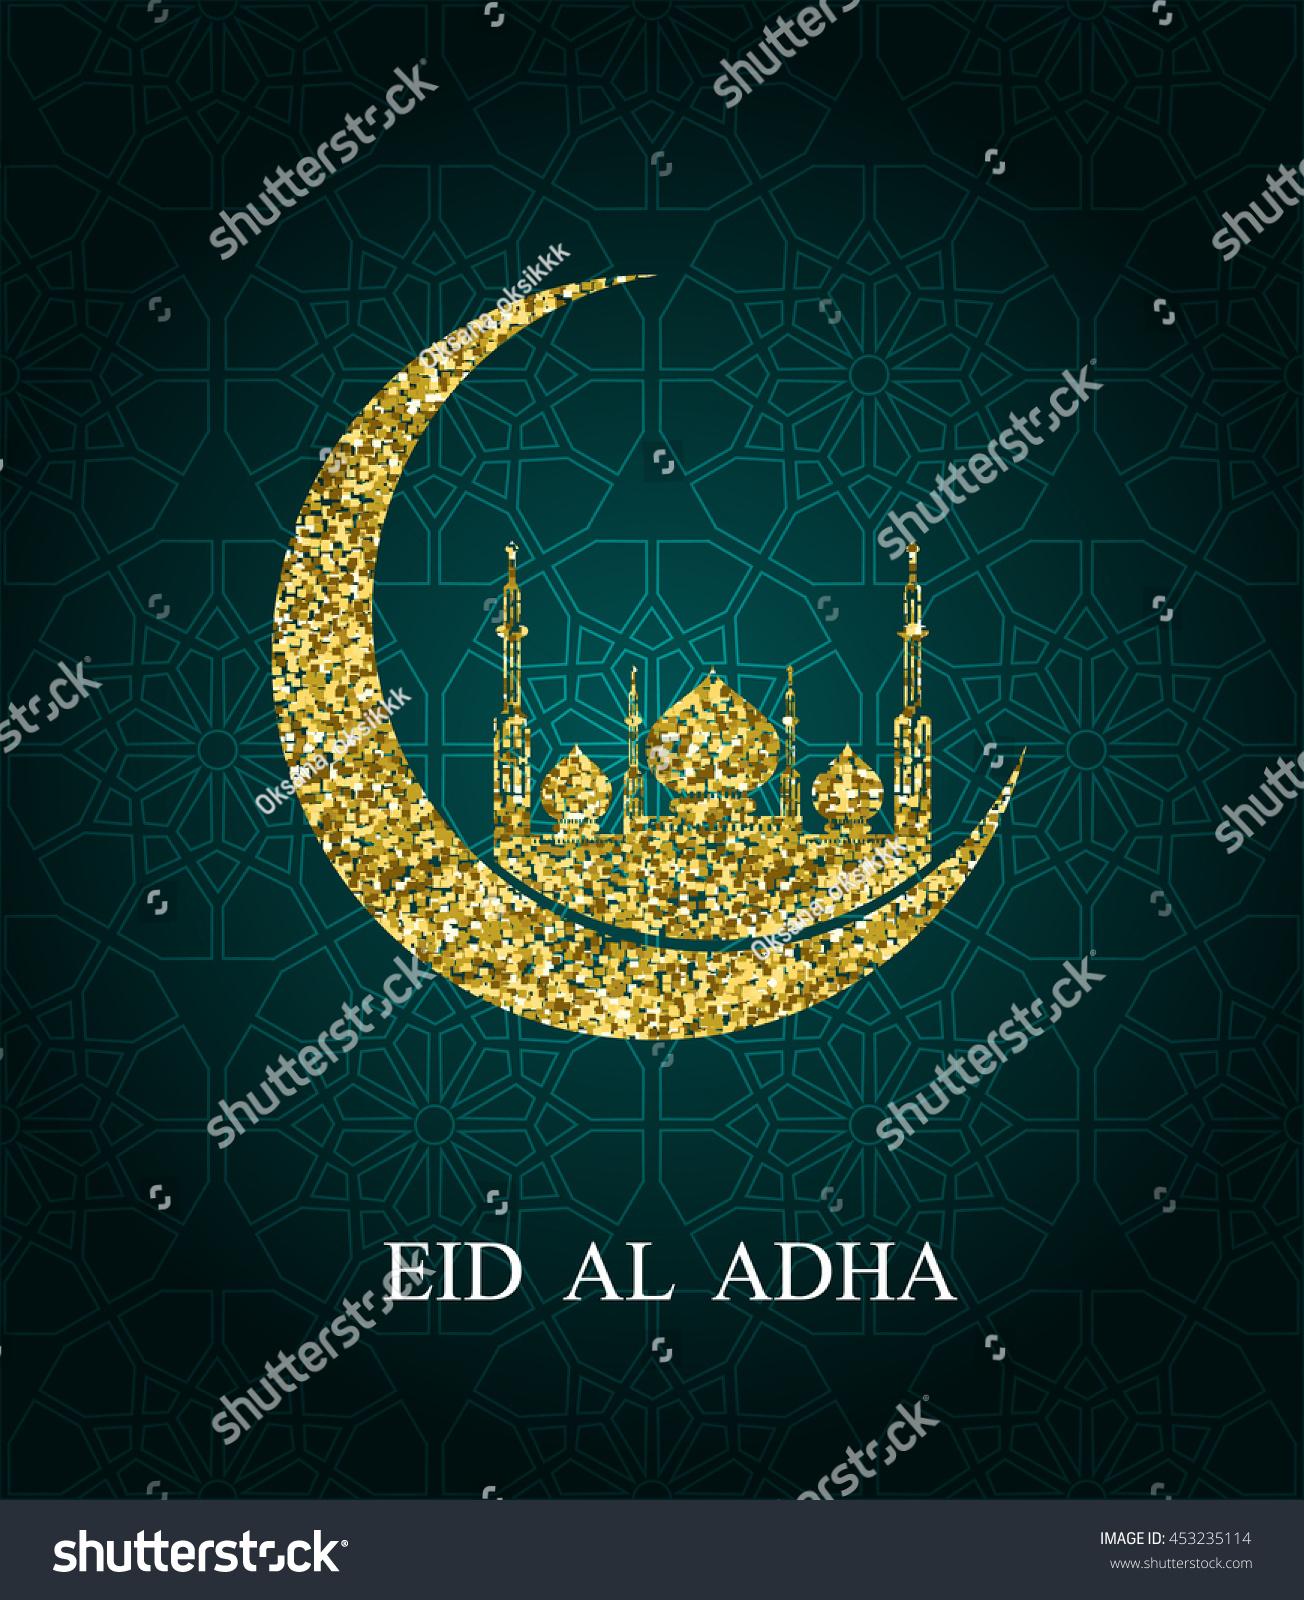 Eid Al Adha Greeting Card Eid Stock Illustration 453235114